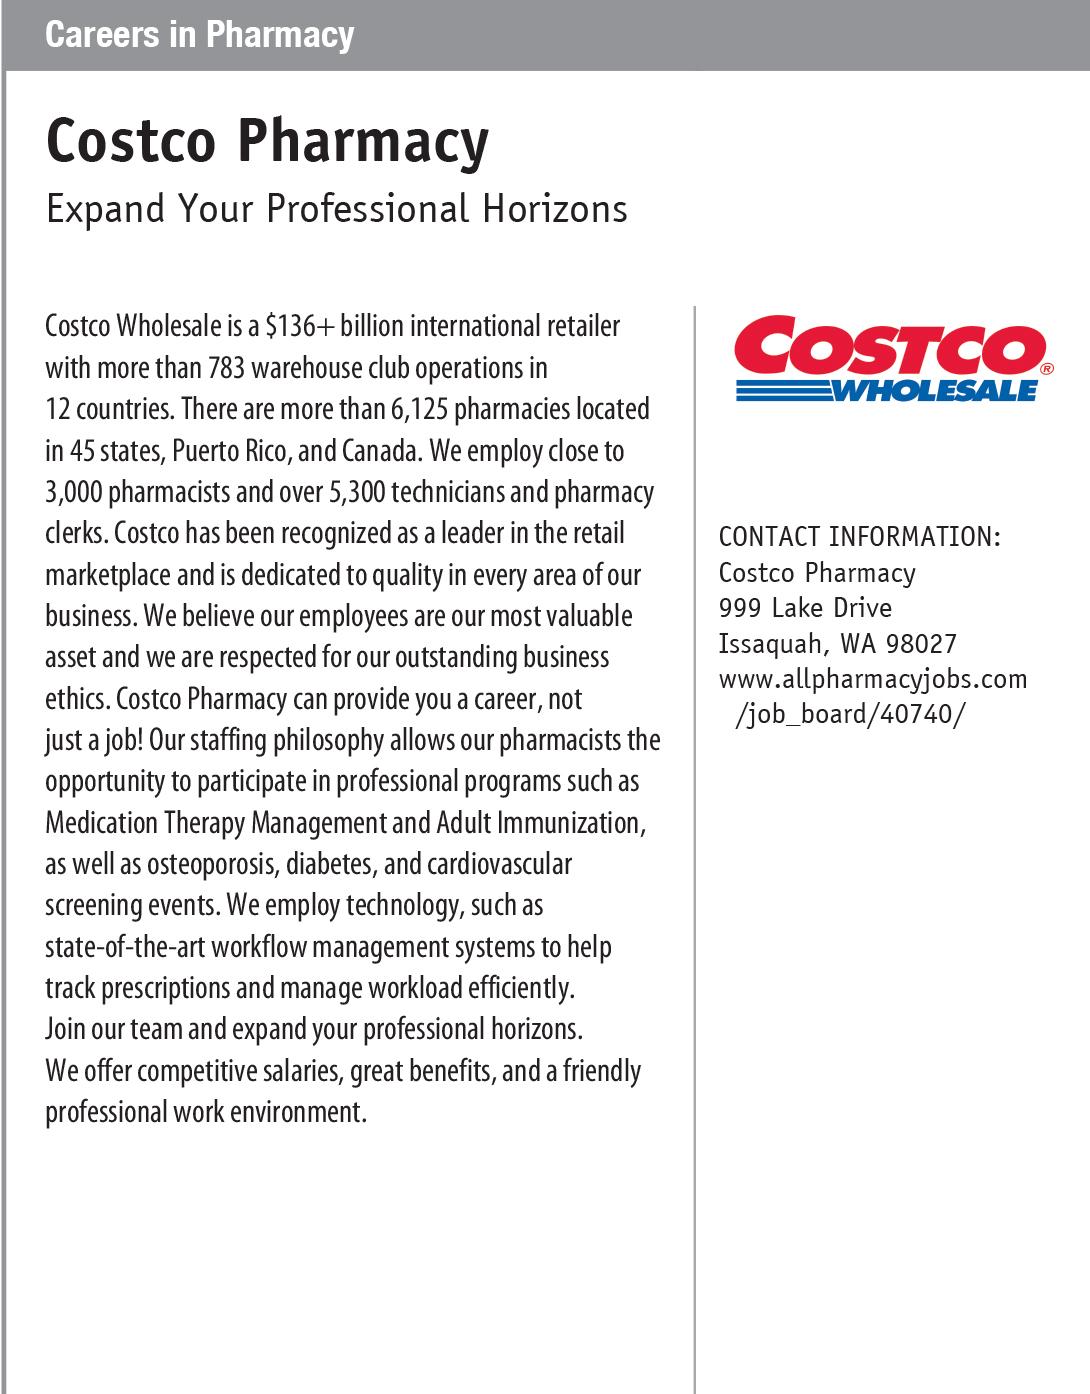 PROFILE_Careers-in-Pharmacy---Costco-Pharmacy.jpg